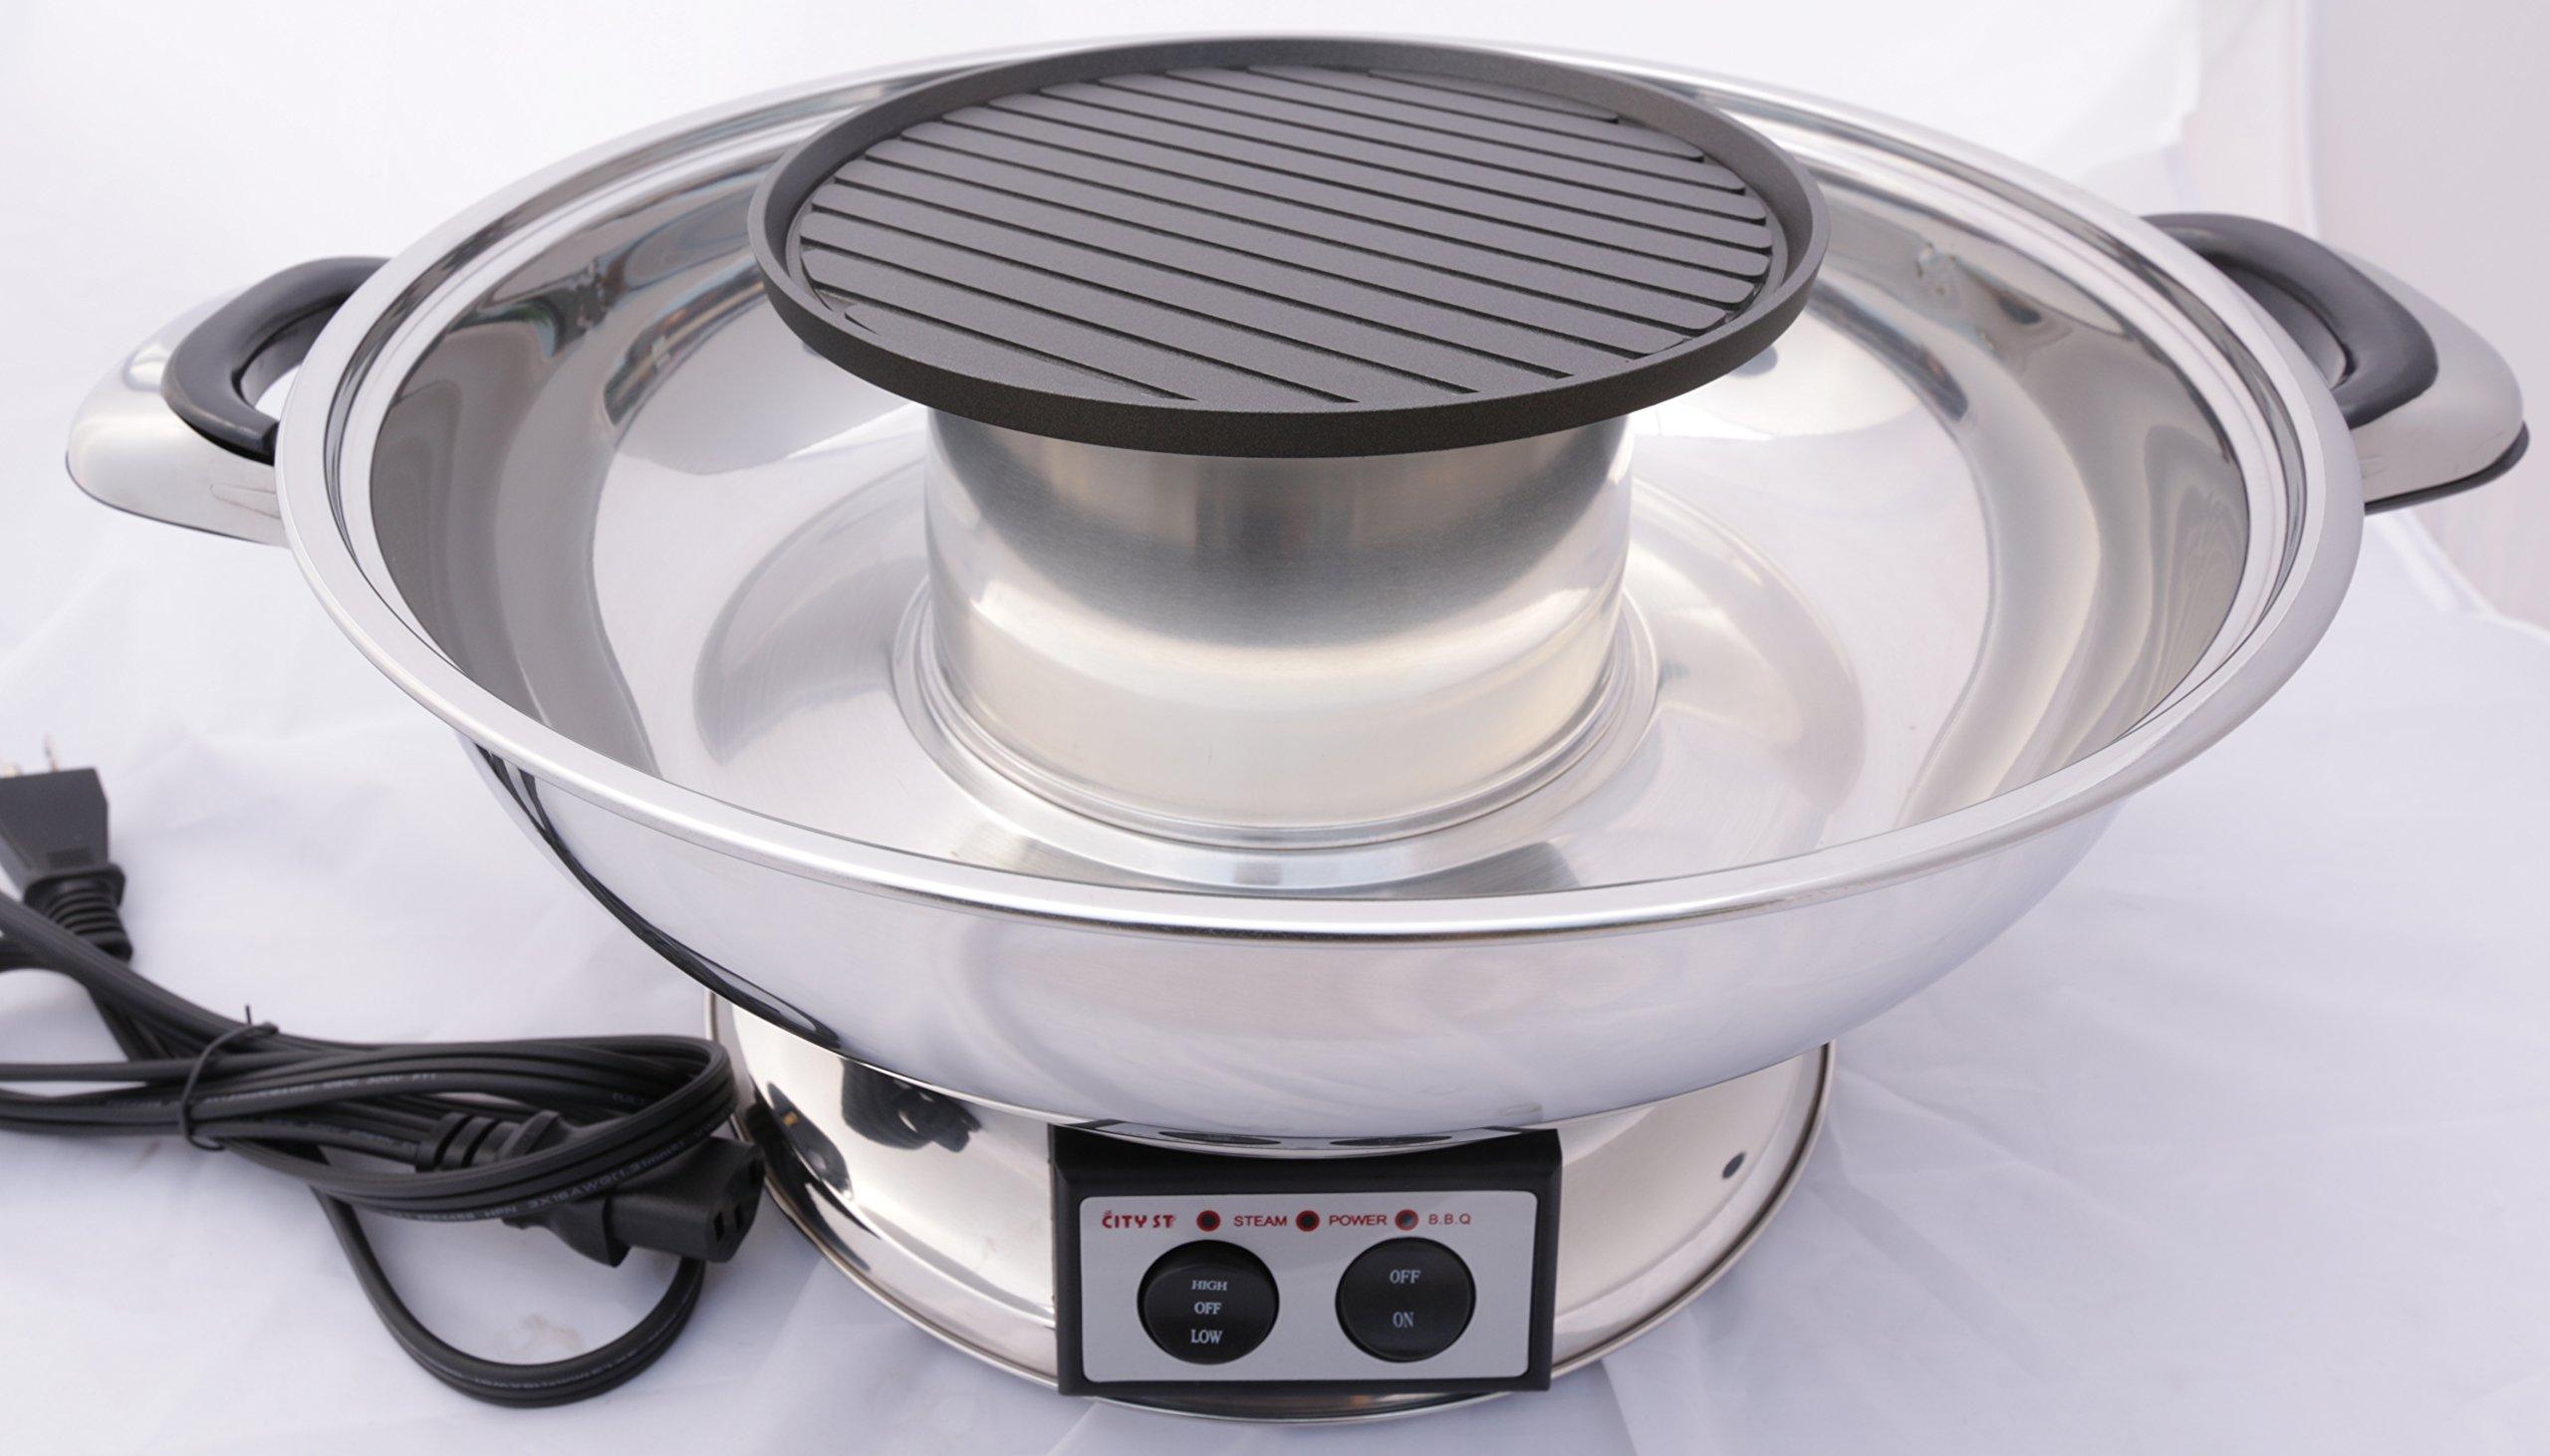 City ST Shabu Shabu Hot Pot w/BBQ Grill by City ST